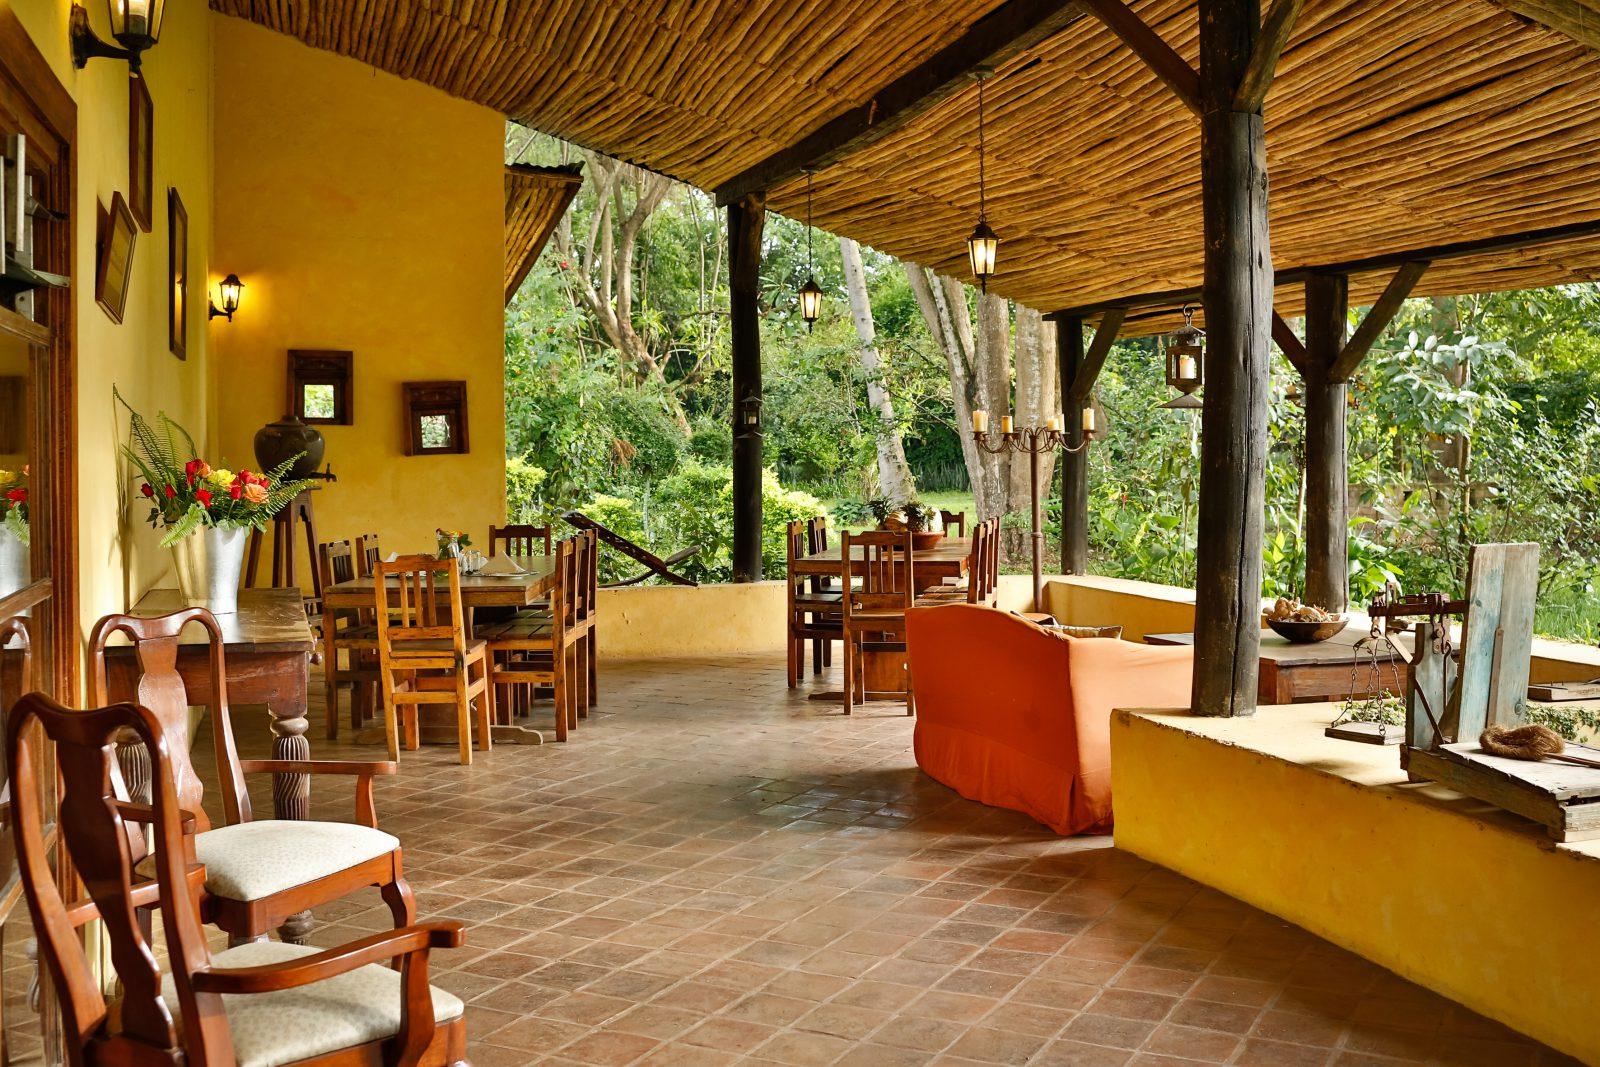 Africa, Tanzania, Arusha, Rivertrees Farm House